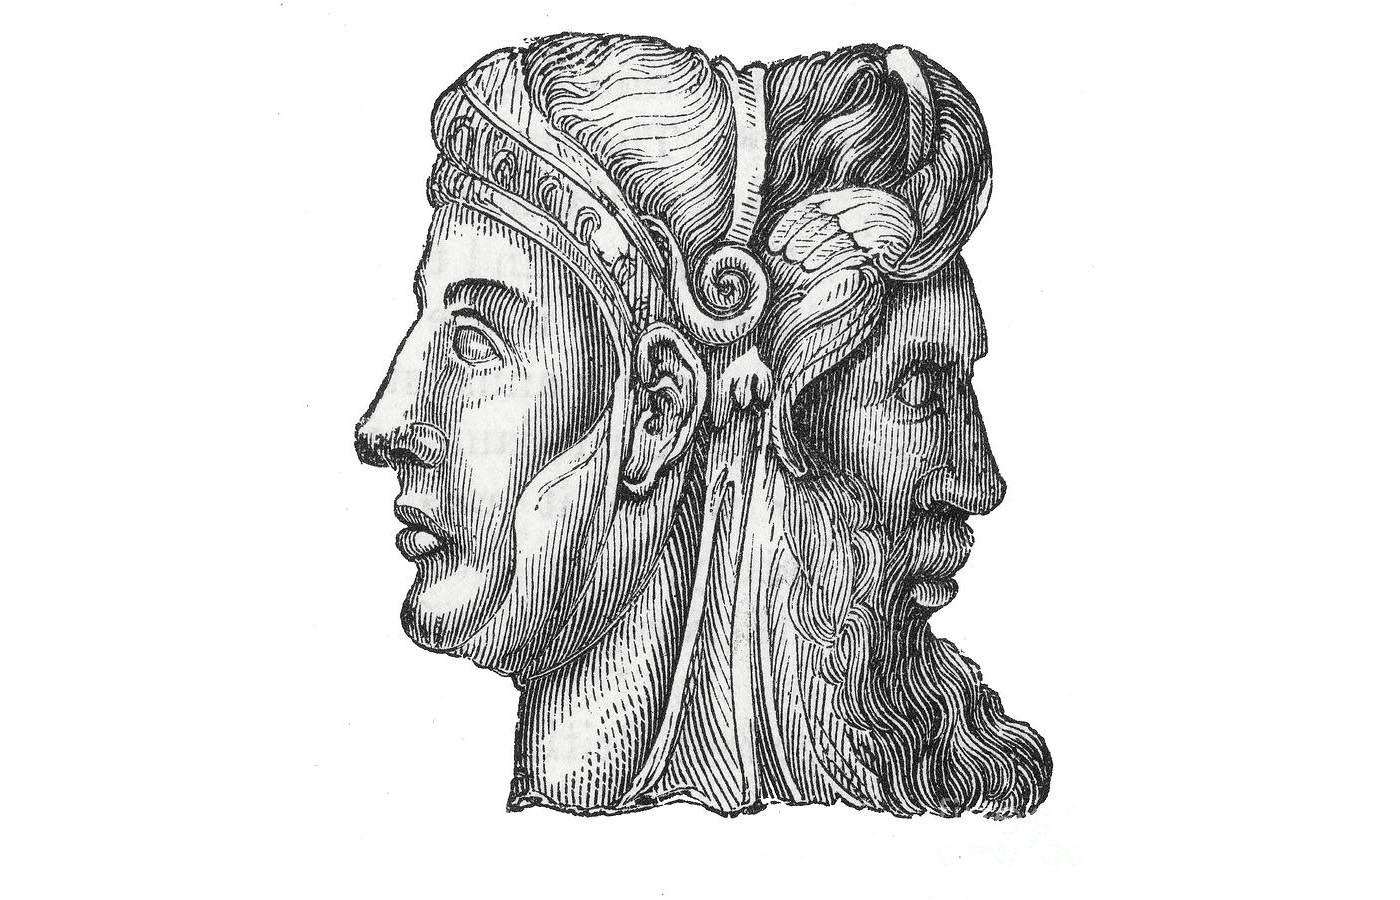 Janus the god of transitions